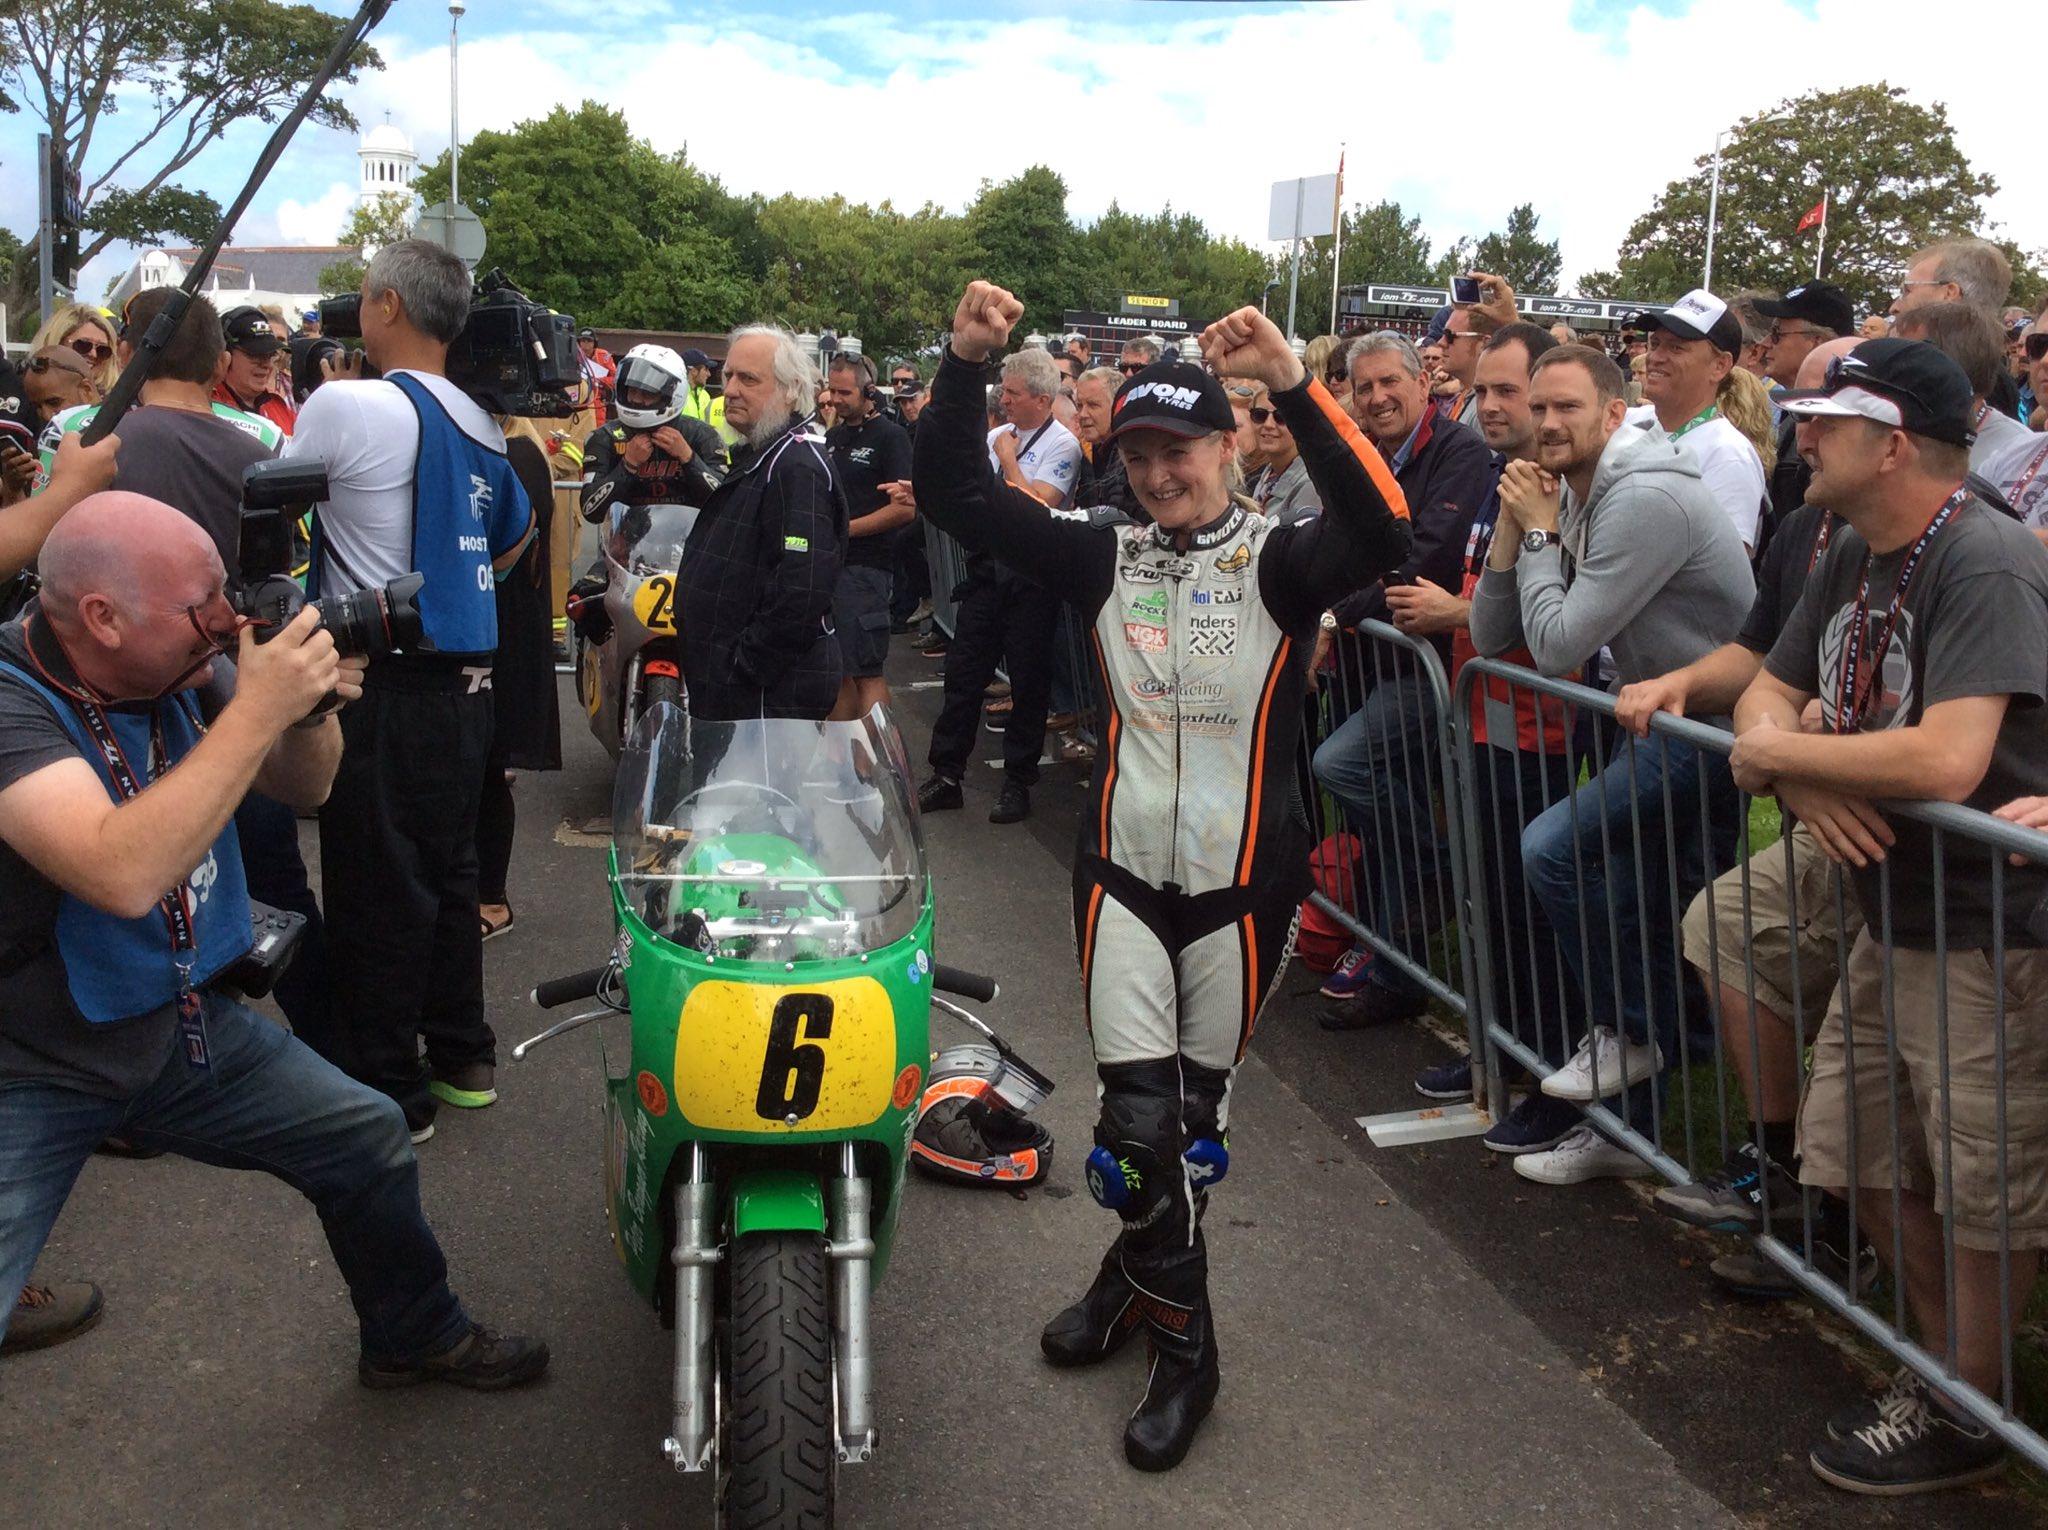 [Road Racing] CLASSIC TT ET MANX GRAND PRIX 2016 - Page 2 Cq3awpPWEAQ-piN